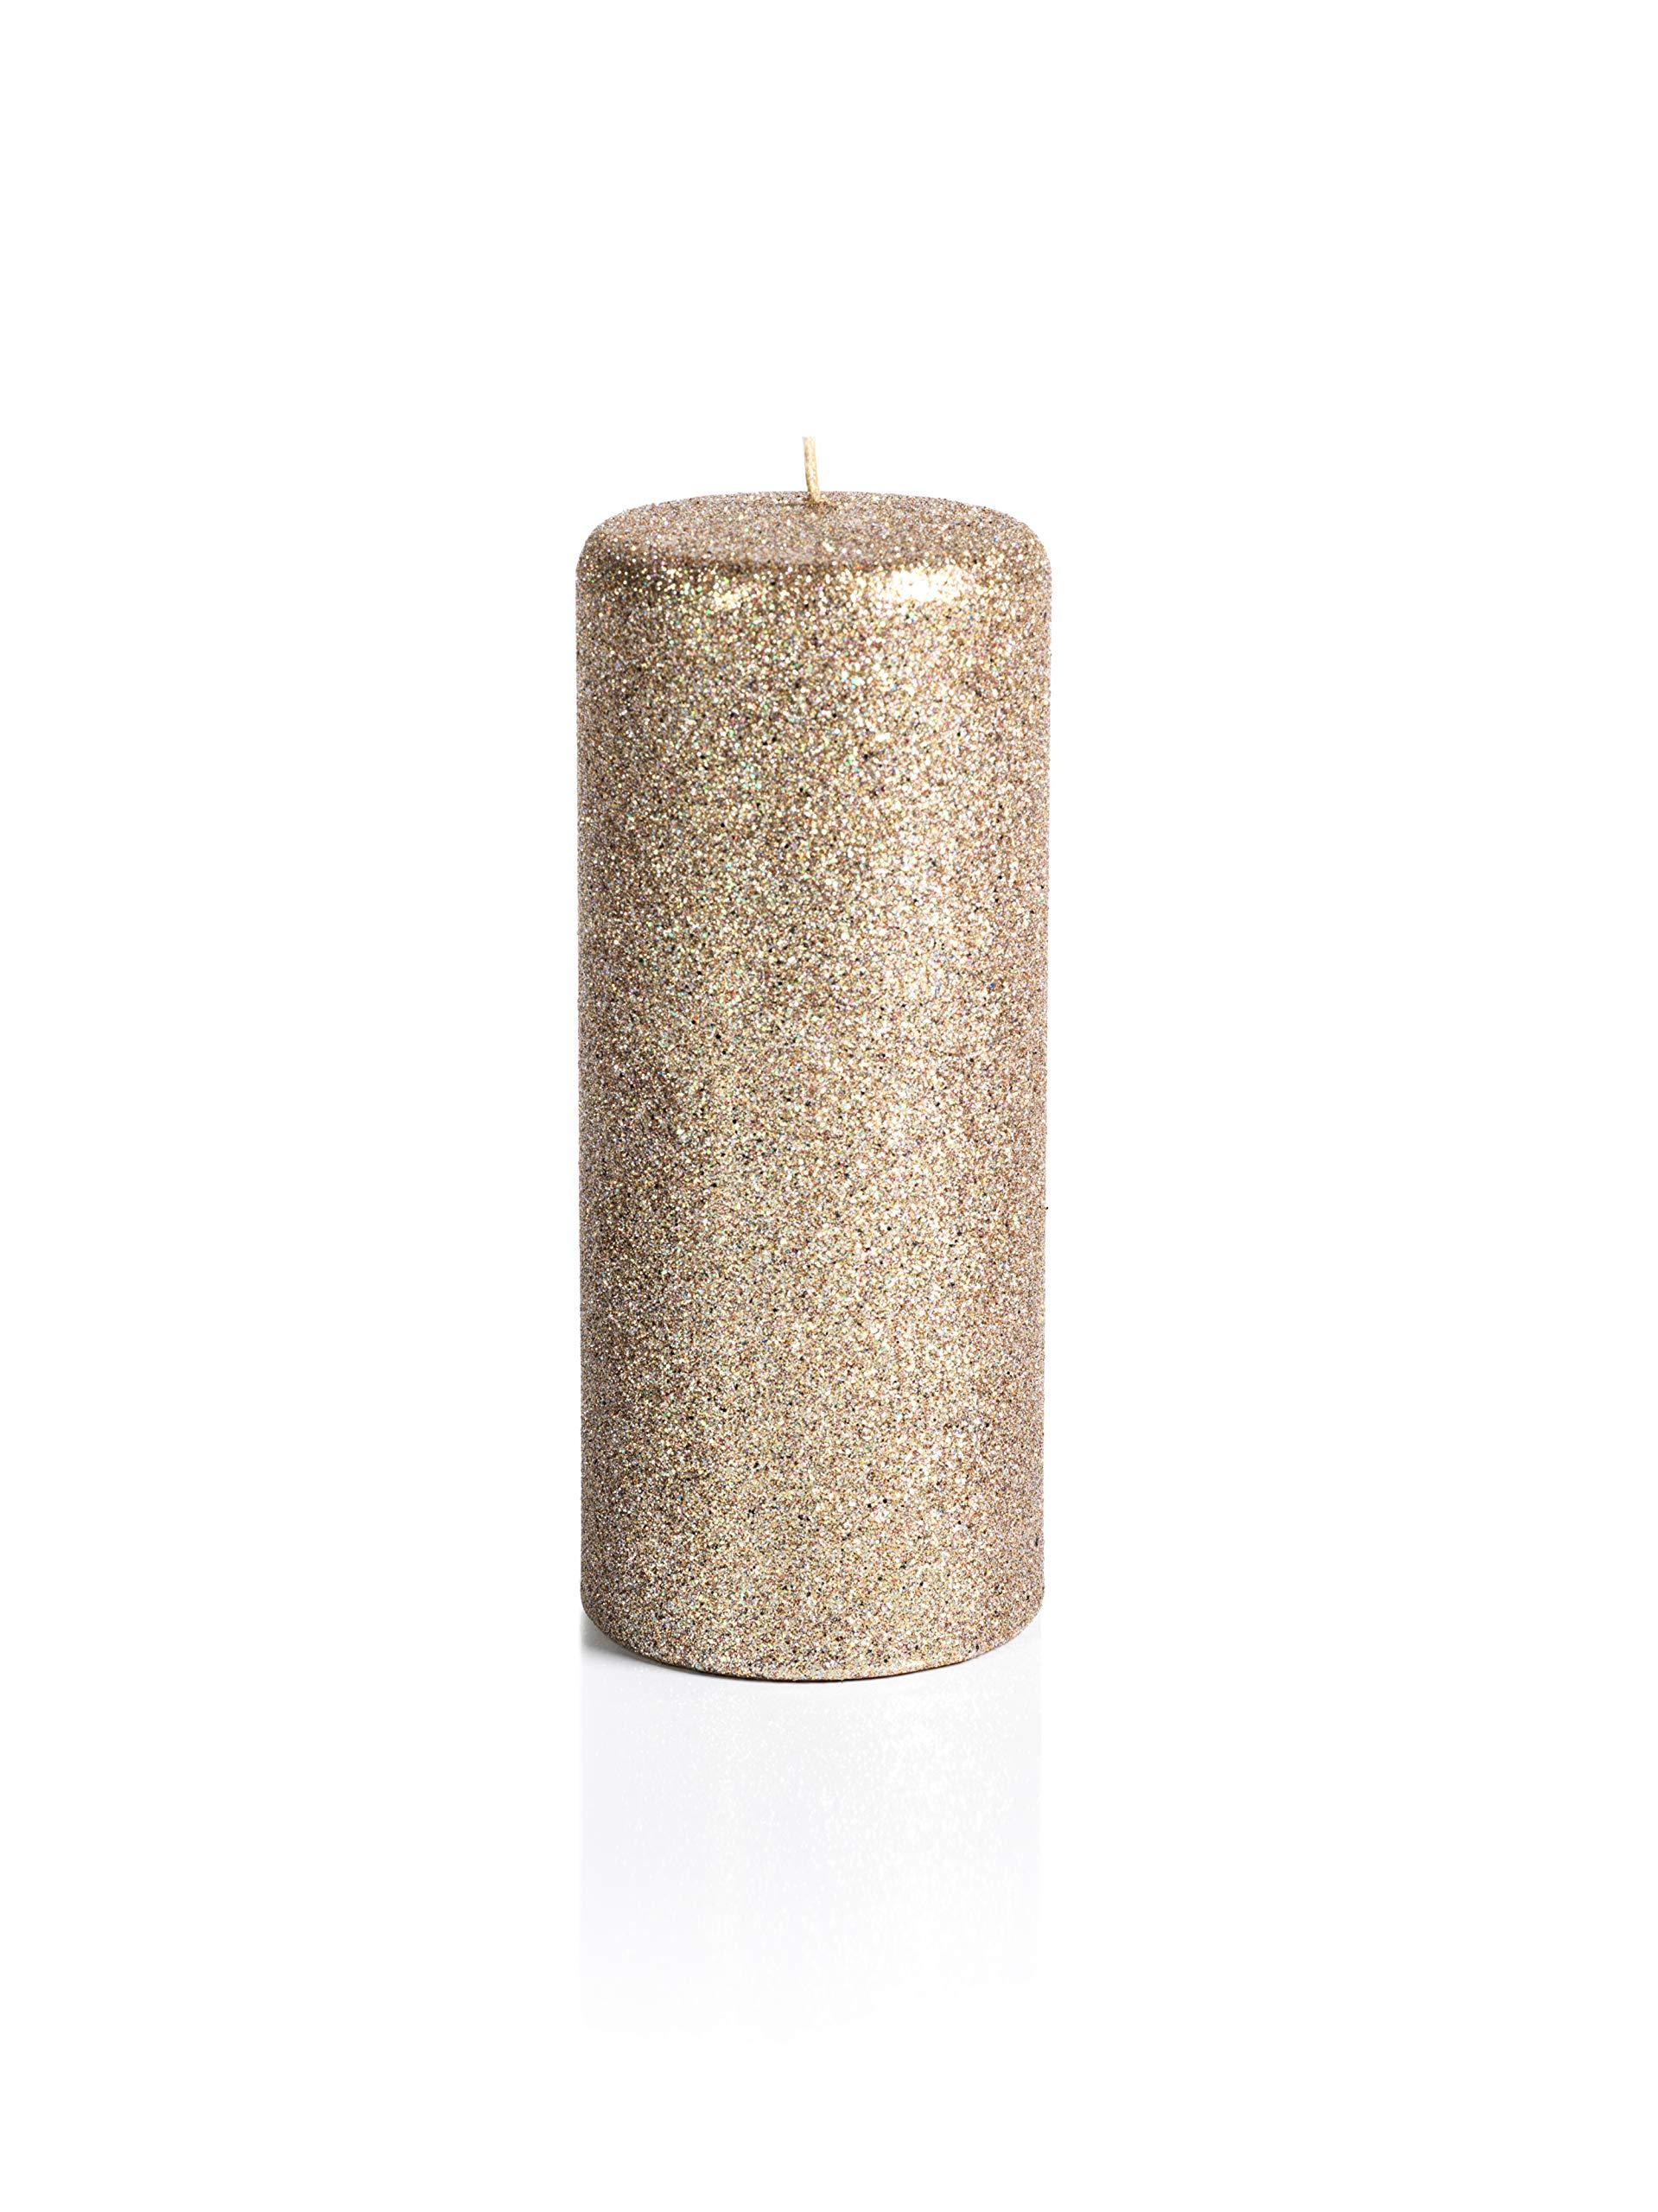 Zodax 7'' Tall Wax Pillar, Gold Glitter (Set of 2) Candles by Zodax (Image #1)